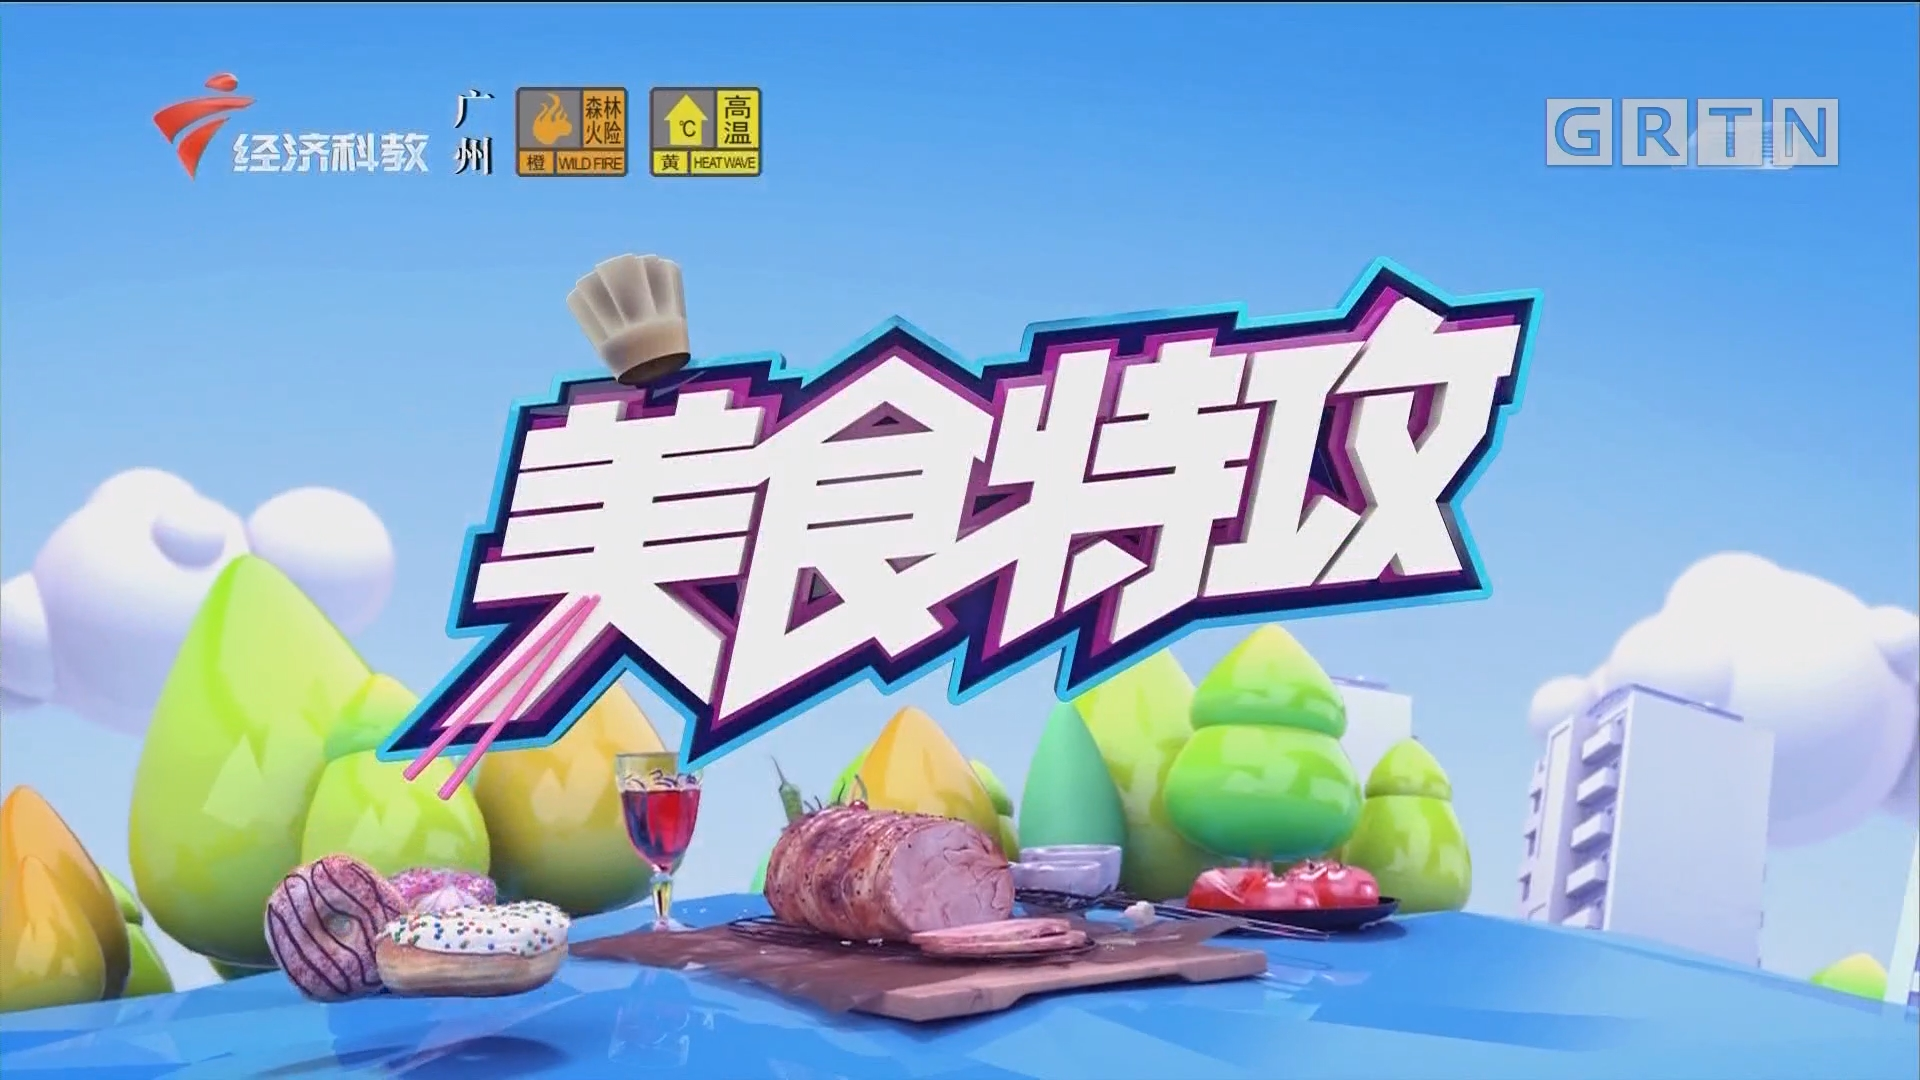 [HD][2020-05-05]美食特攻:藿香玉蠶粉燜鱖魚——對春困說拜拜